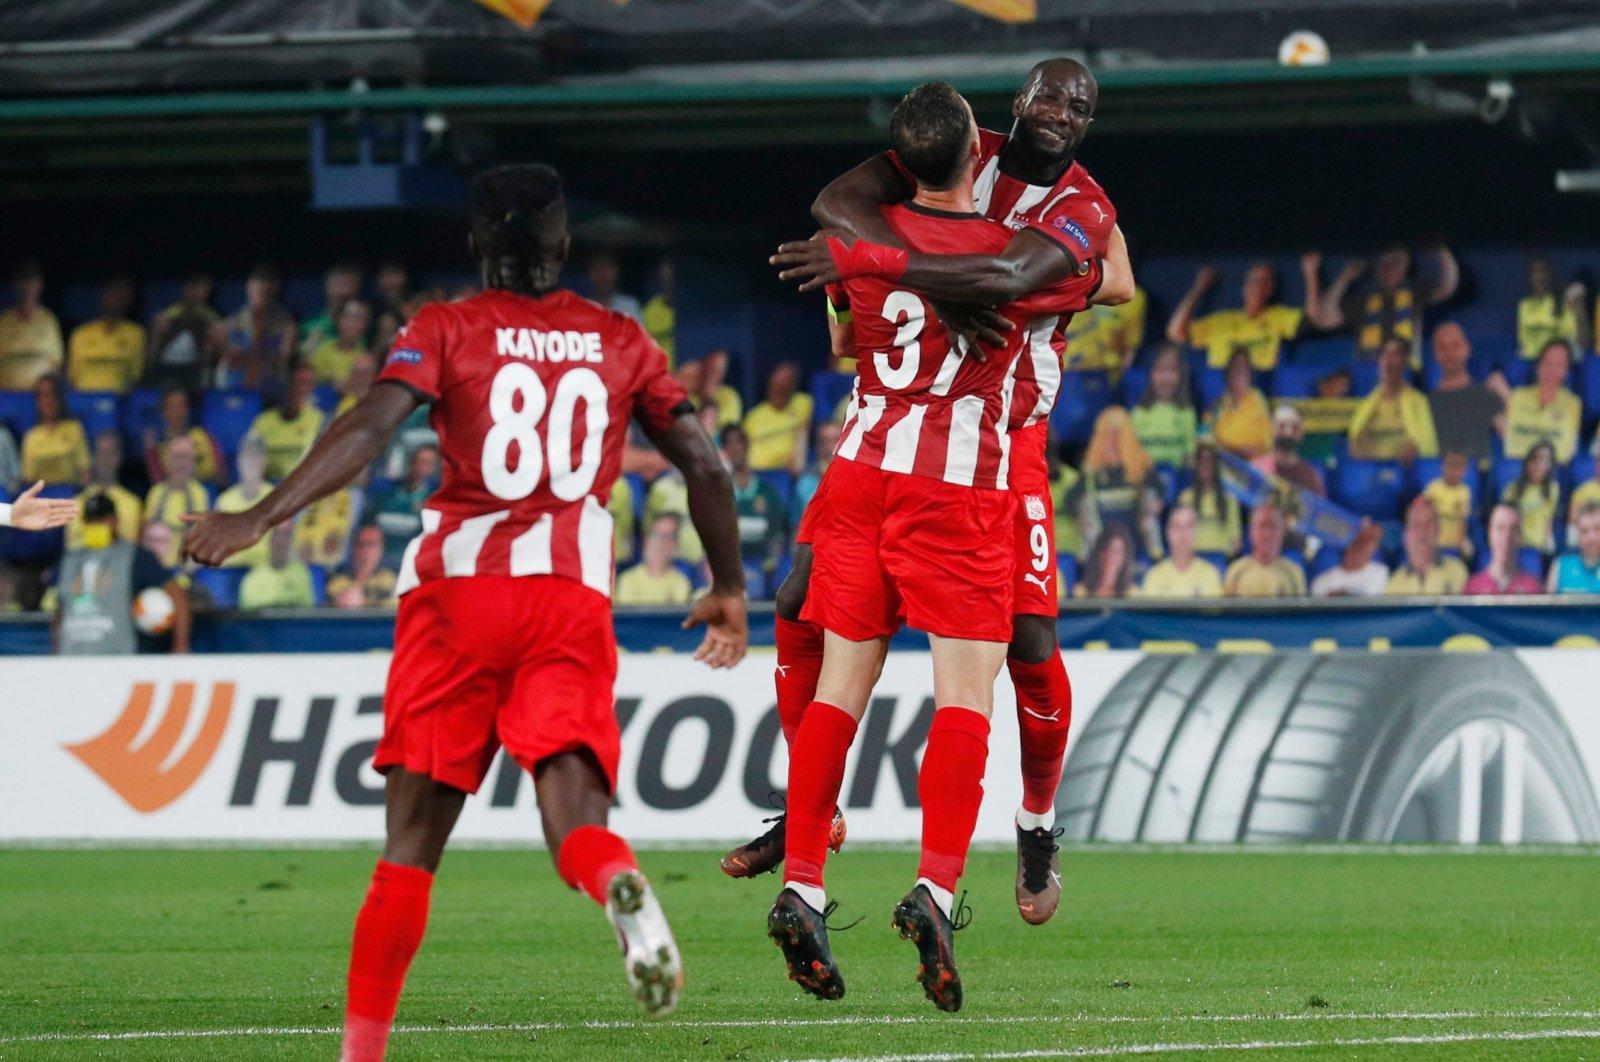 Sivasspor players celebrate a goal against Villarreal during a UEFA Europa League match, in Villarreal, Spain, Oct. 22, 2020. (Reuters Photo)